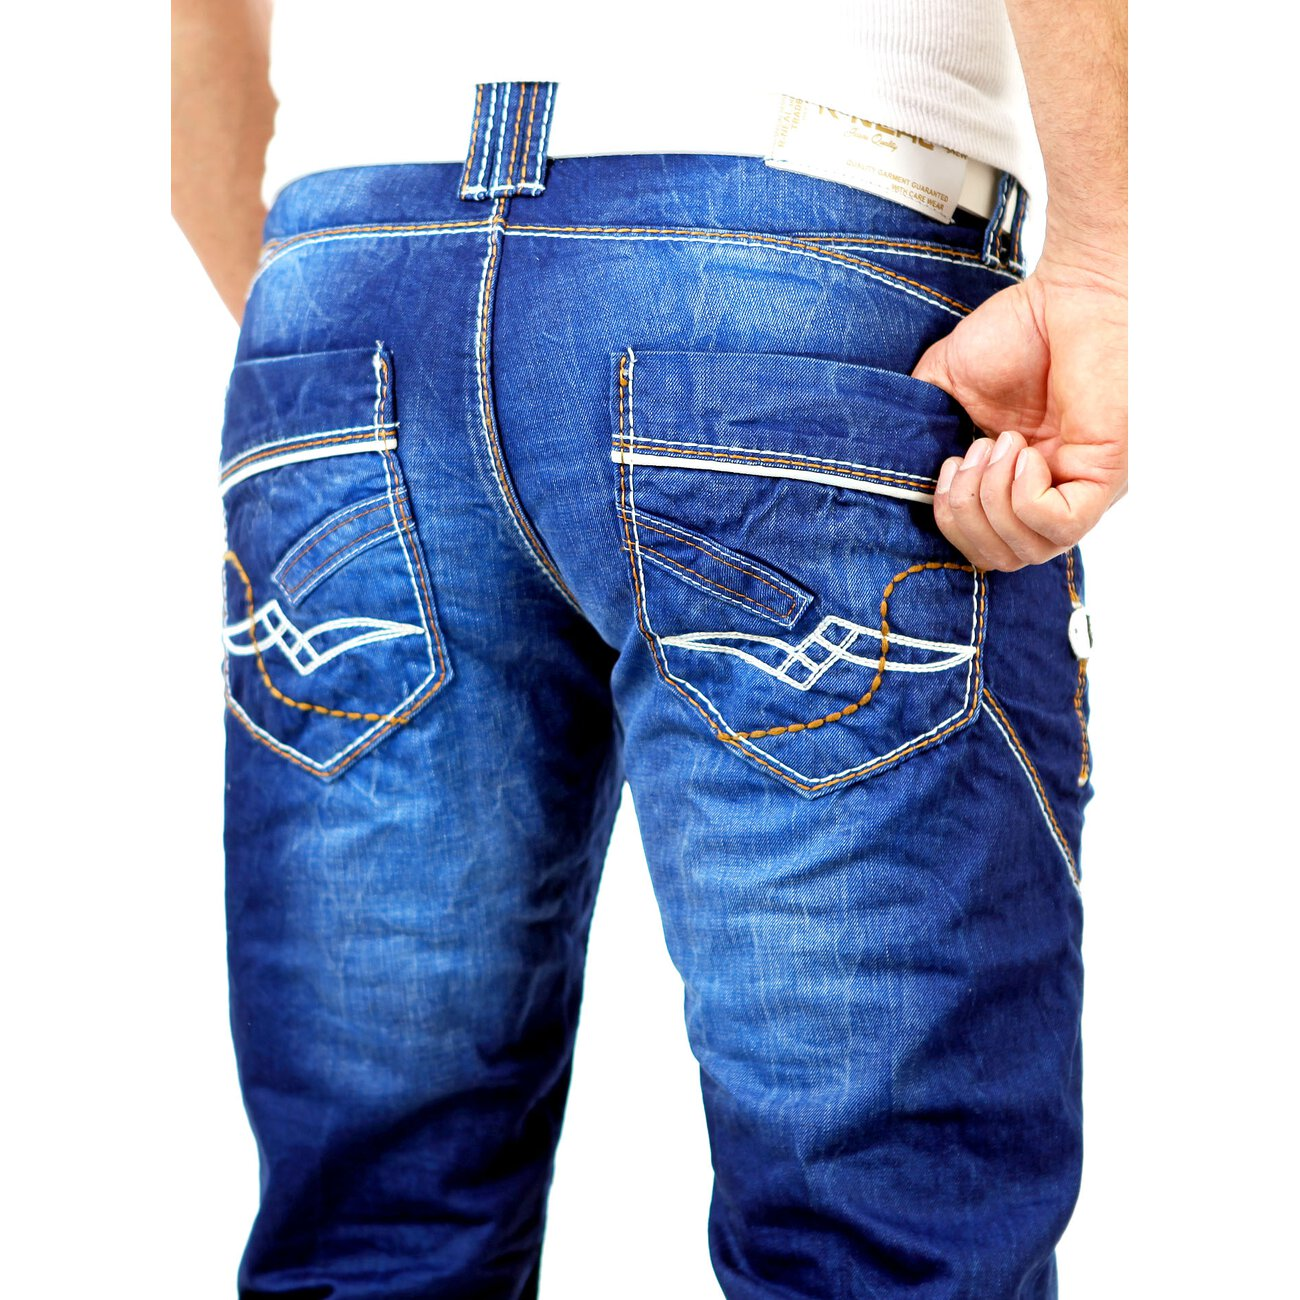 r neal jeans blau used look 8442 25 jeanshosen kaufen. Black Bedroom Furniture Sets. Home Design Ideas